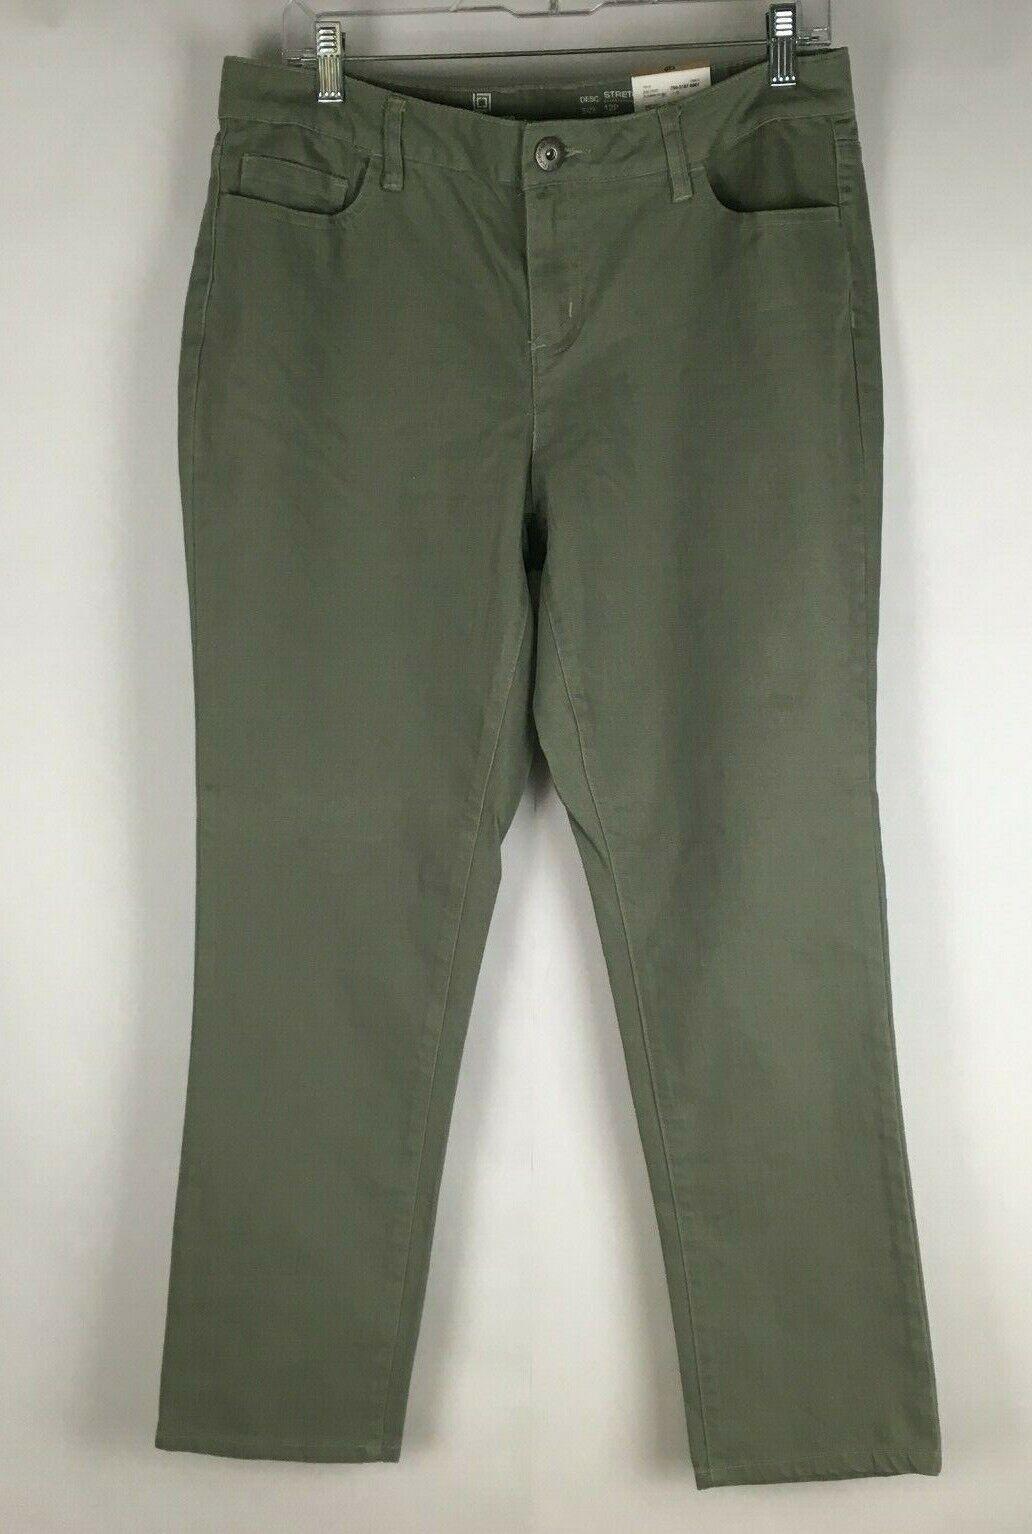 Liz Claiborne Women's Pants Size 12 Petite Sage Green Slim A